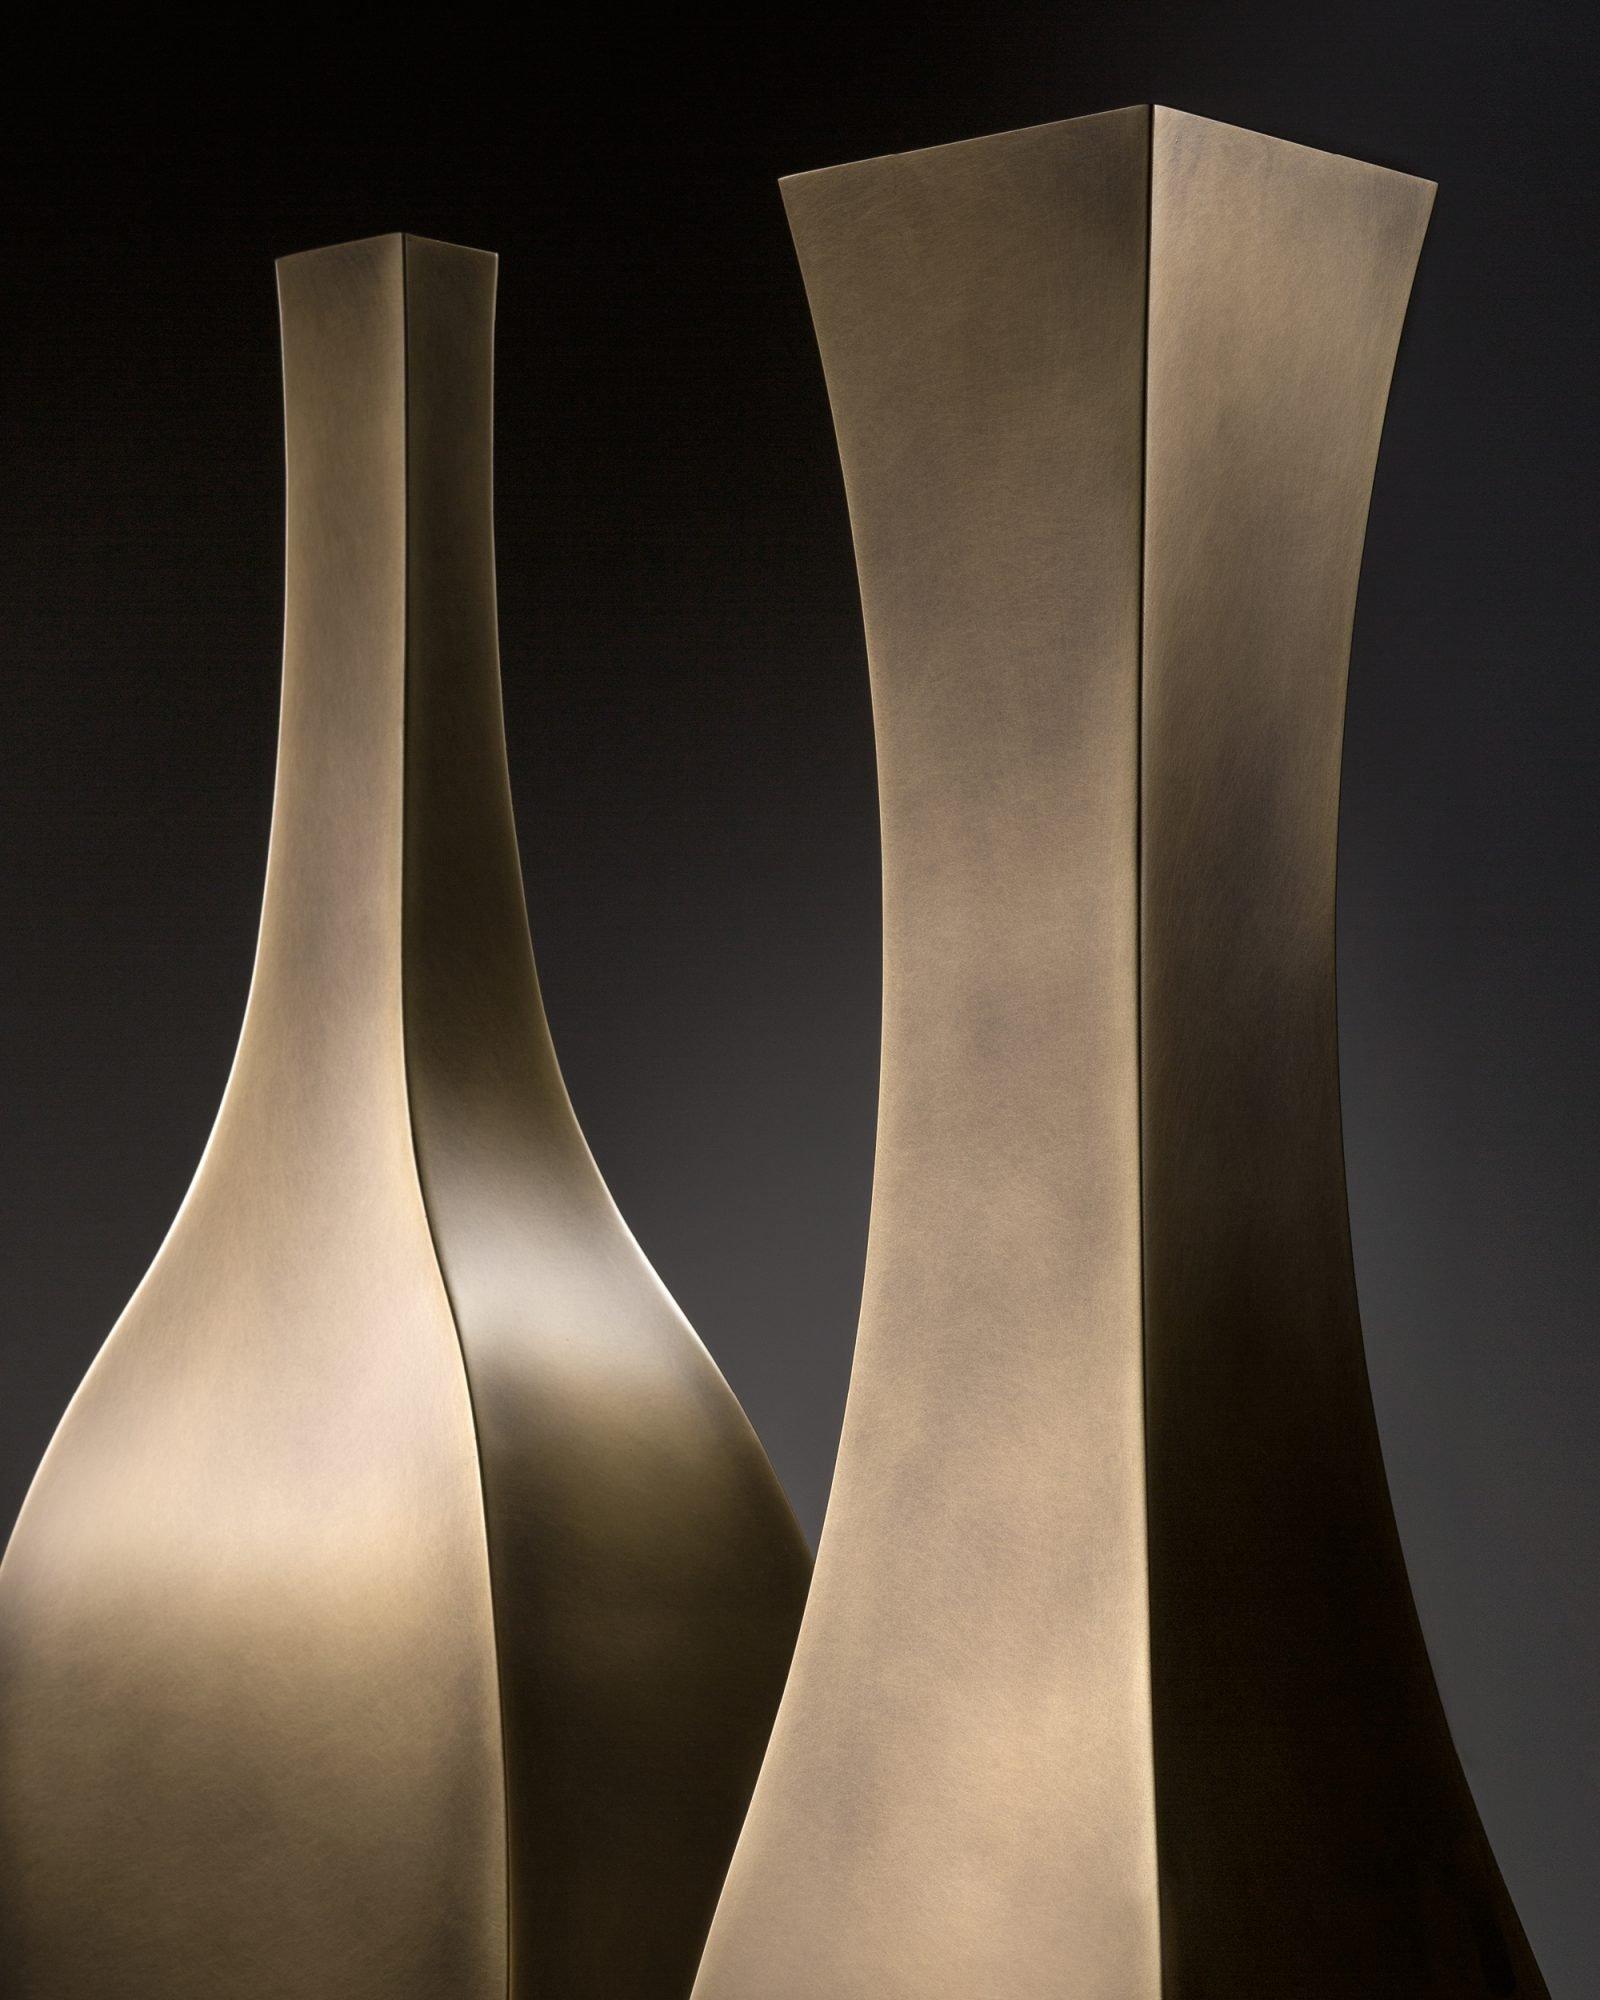 Rocco & Lolita Pots  from De Castelli, designed by Stefano Dussin